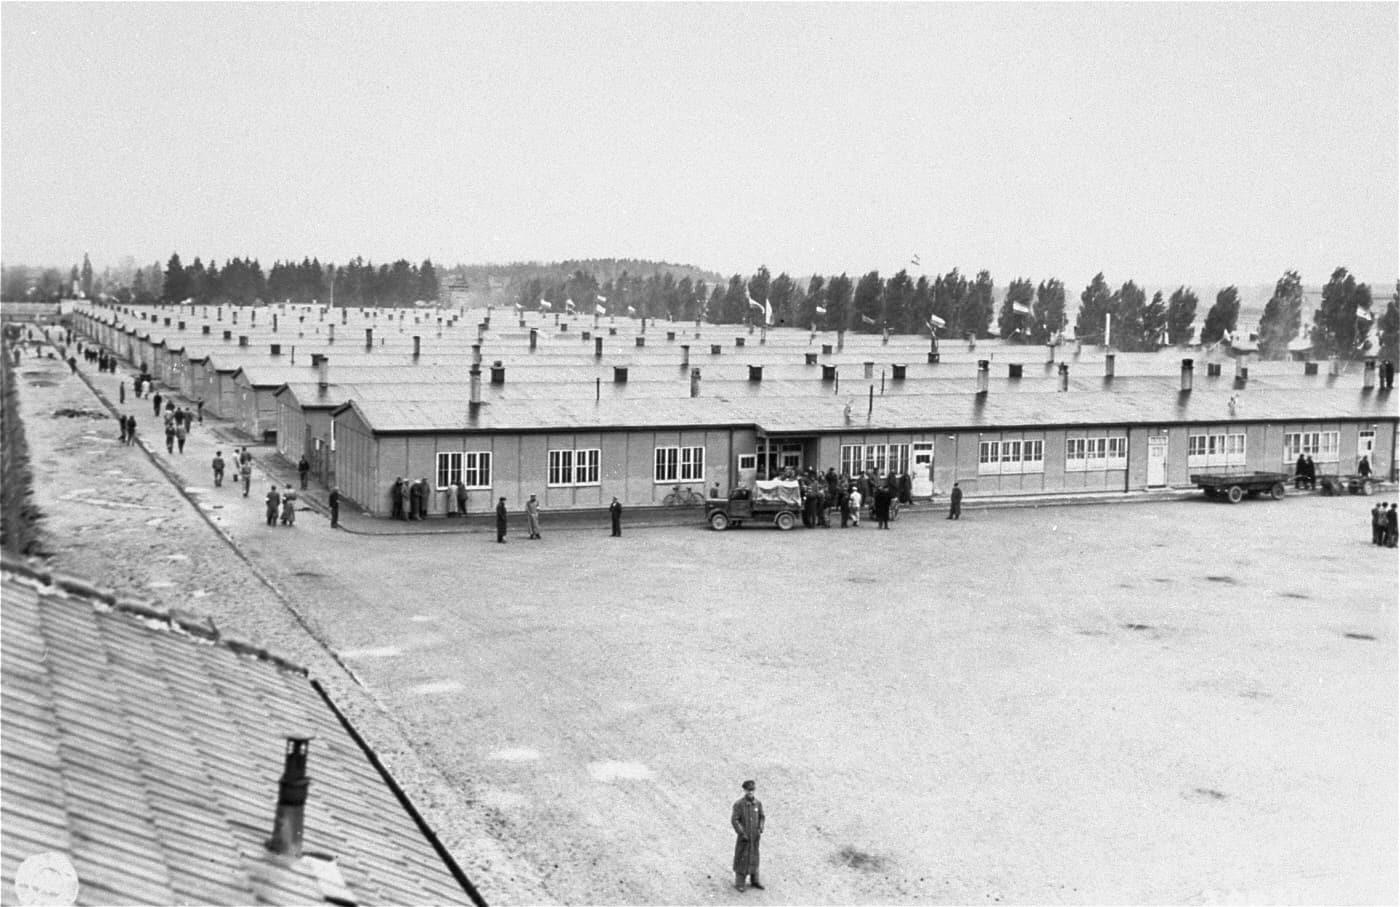 Prisoner's barracks at Dachau concentration camp